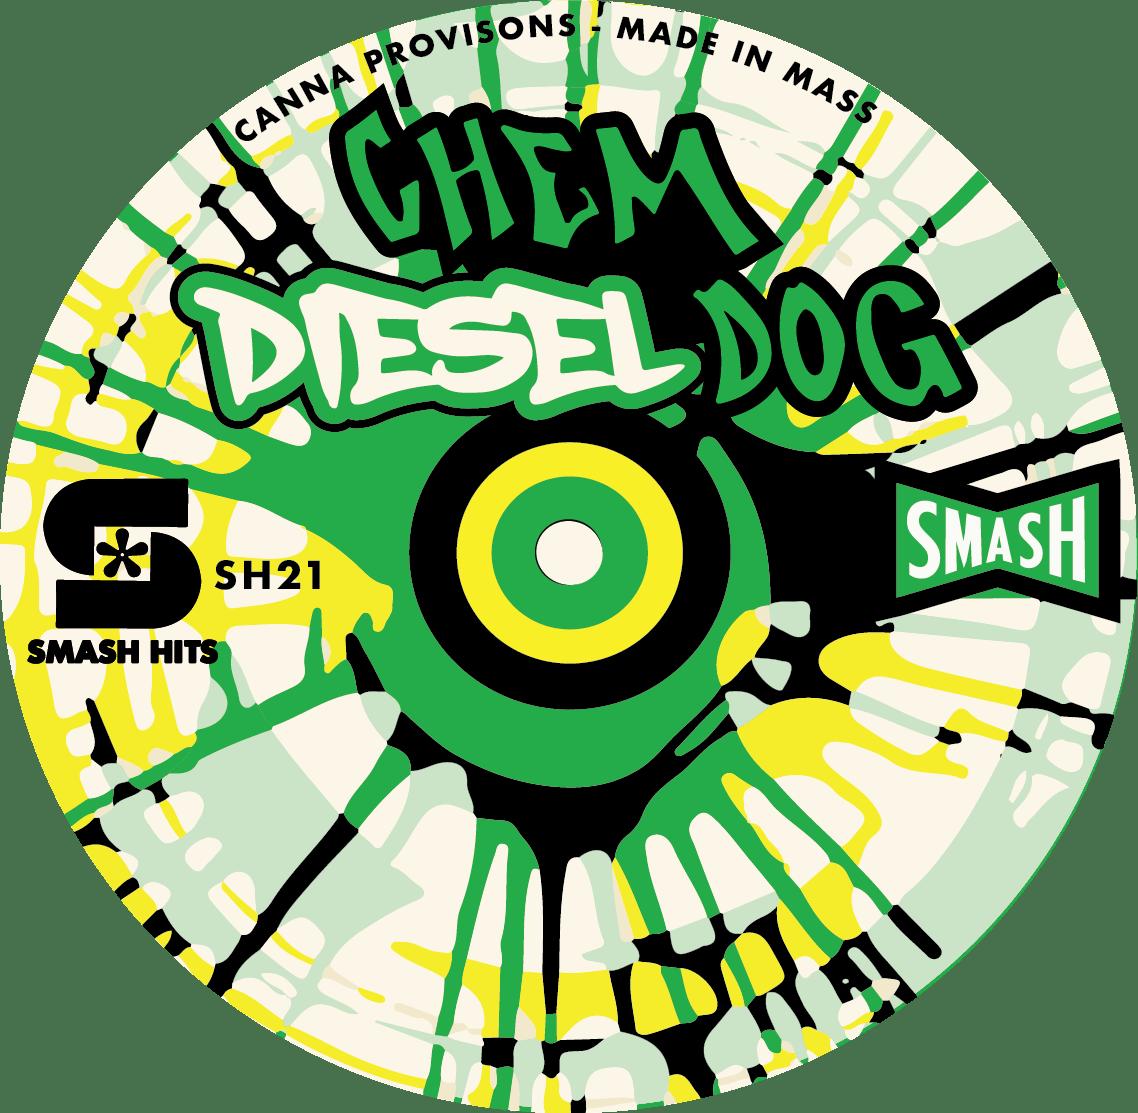 Chem Diesel Dog Chem D smash hits chemdog canna provisions